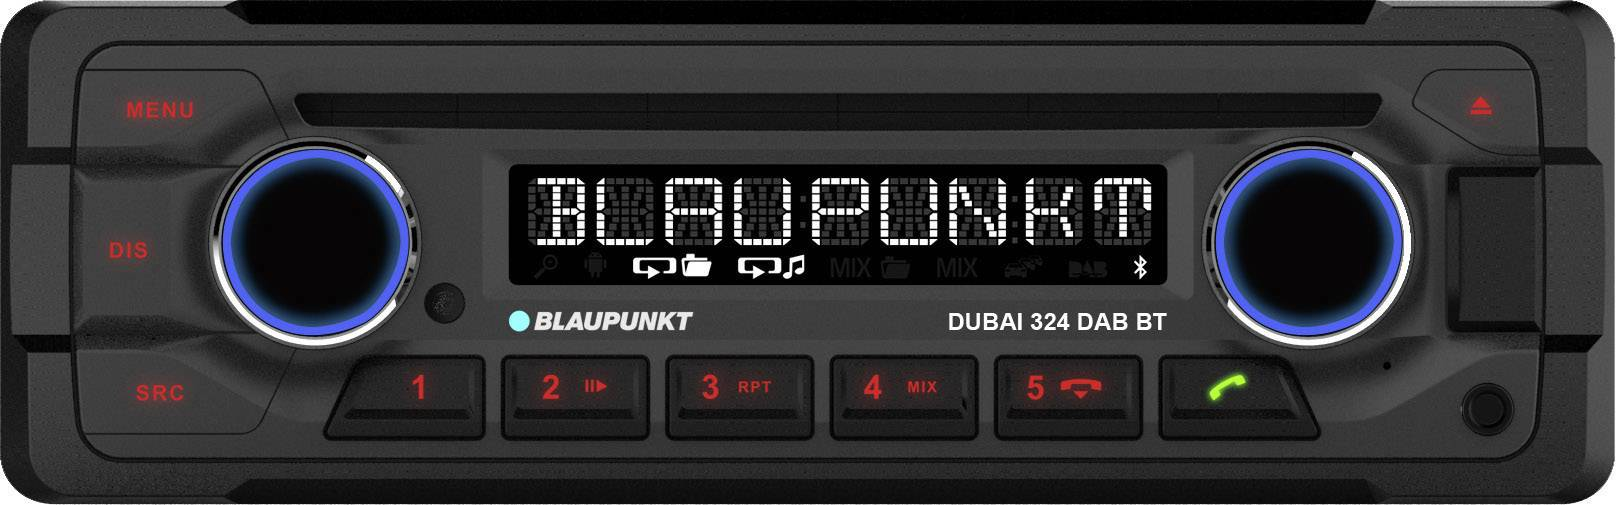 Conrad-Blaupunkt DUBAI-324 DABBT Autoradio enkel DIN DAB+ tuner, Bluetooth handsfree, Aansluiting voor stuurbediening-aanbieding